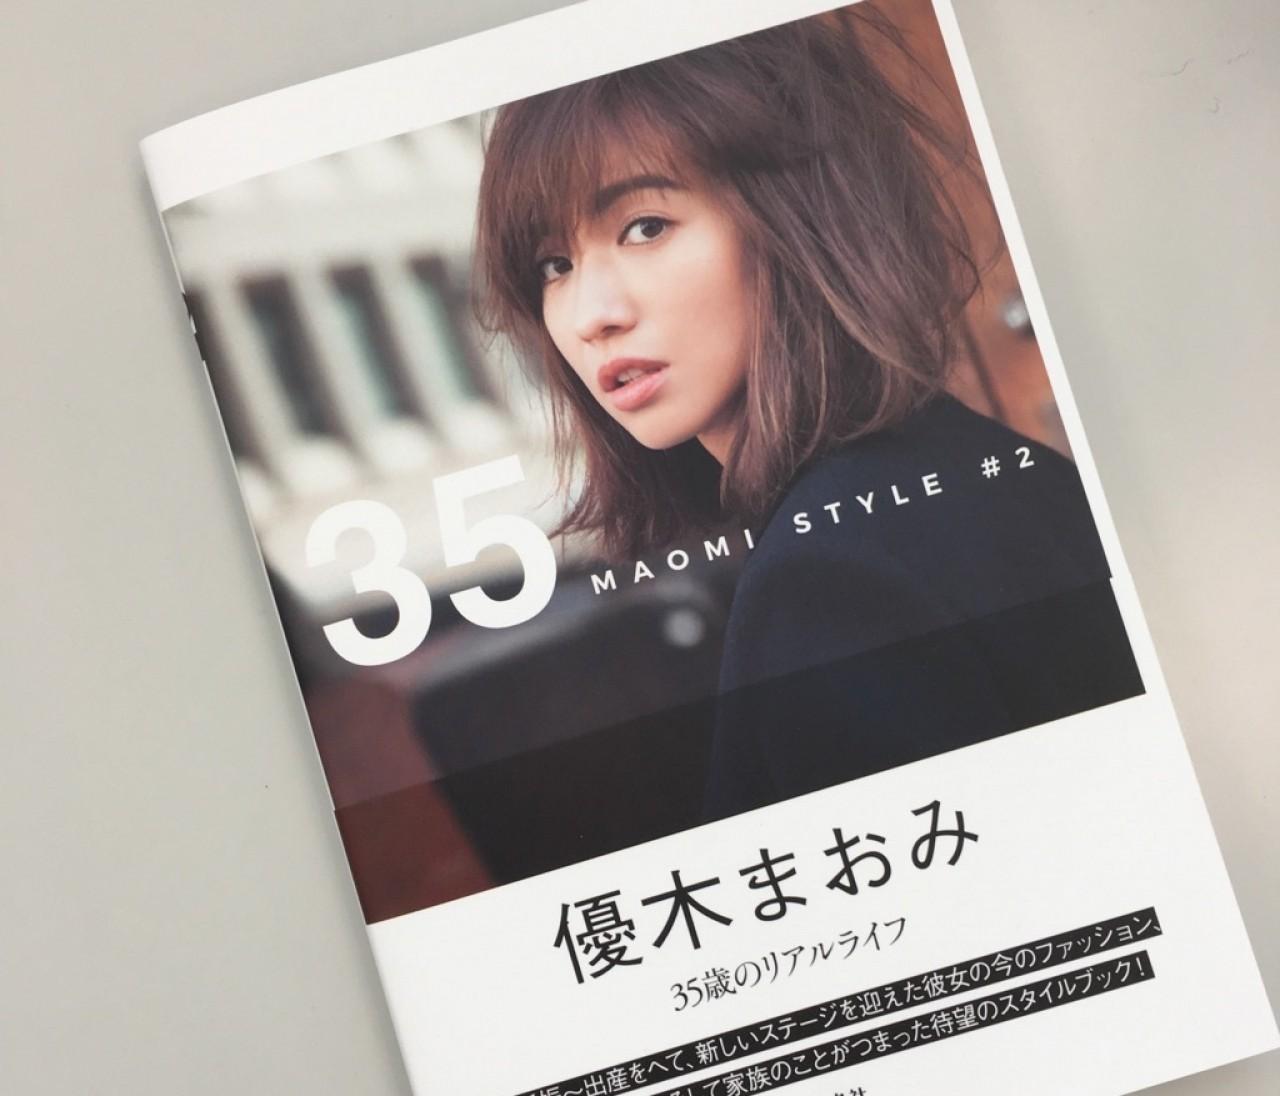 「35 MAOMI STYLE #2」優木まおみちゃんの新刊です!